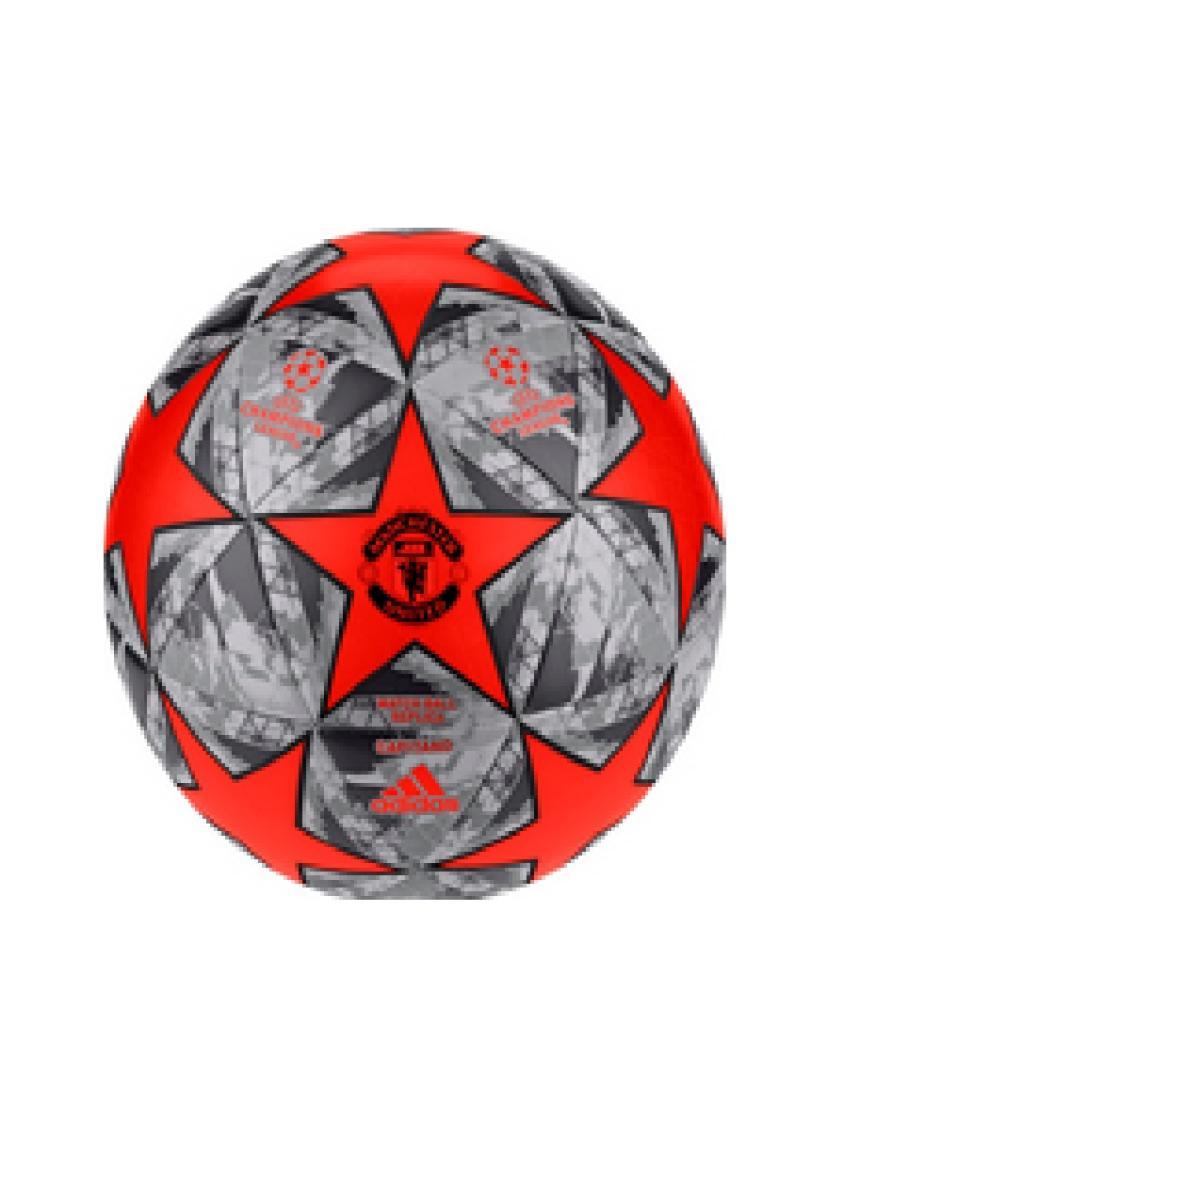 Bola Masculina Adidas Dy2538 Finale Mufc Cpt Preto/laranja